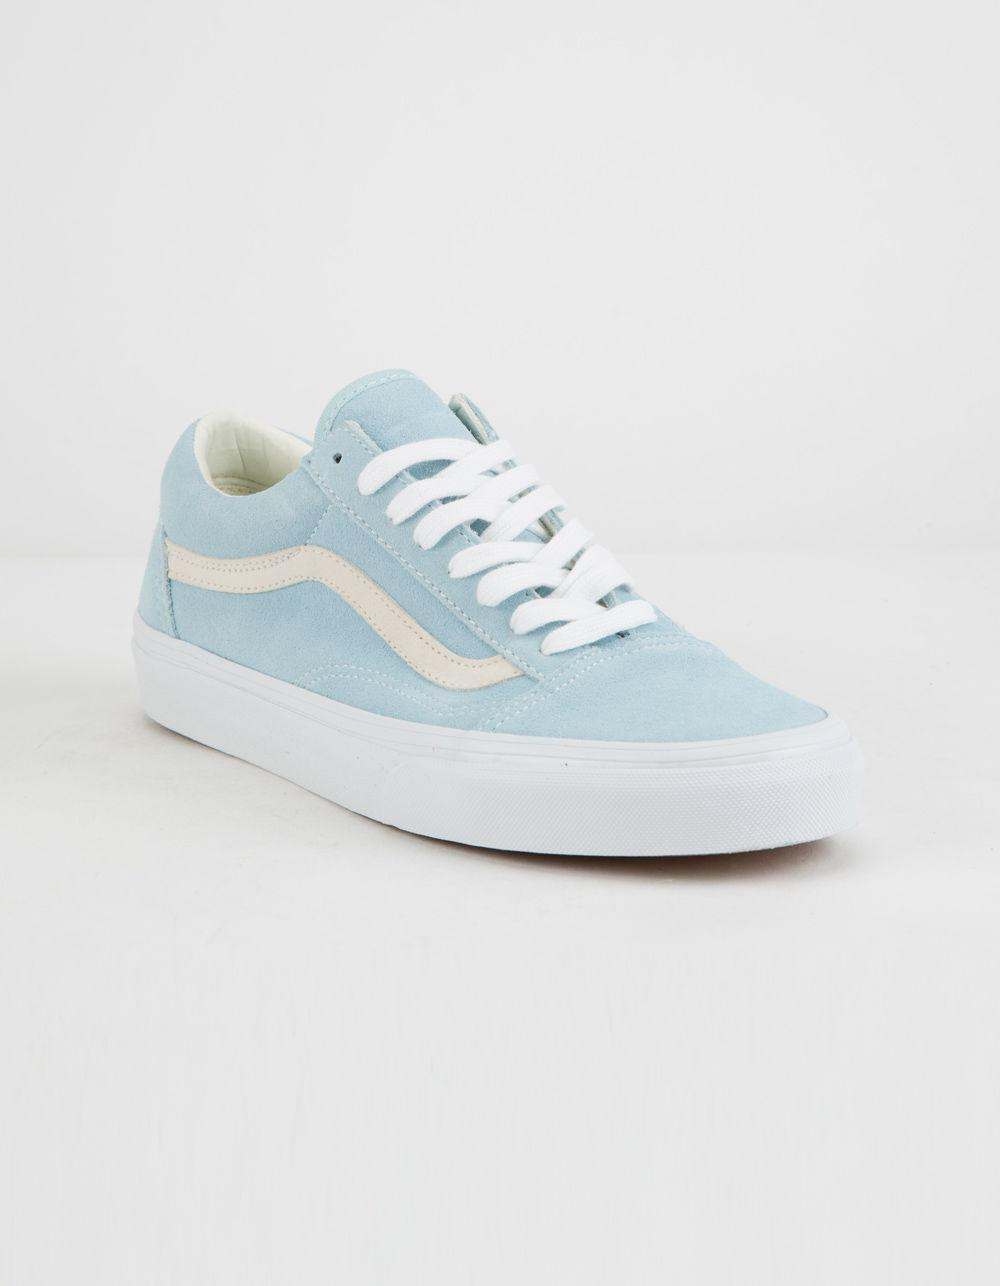 1e3ef67d4a Lyst - Vans Pastel Suede Old Skool Crystal Blue Womens Shoes in Blue